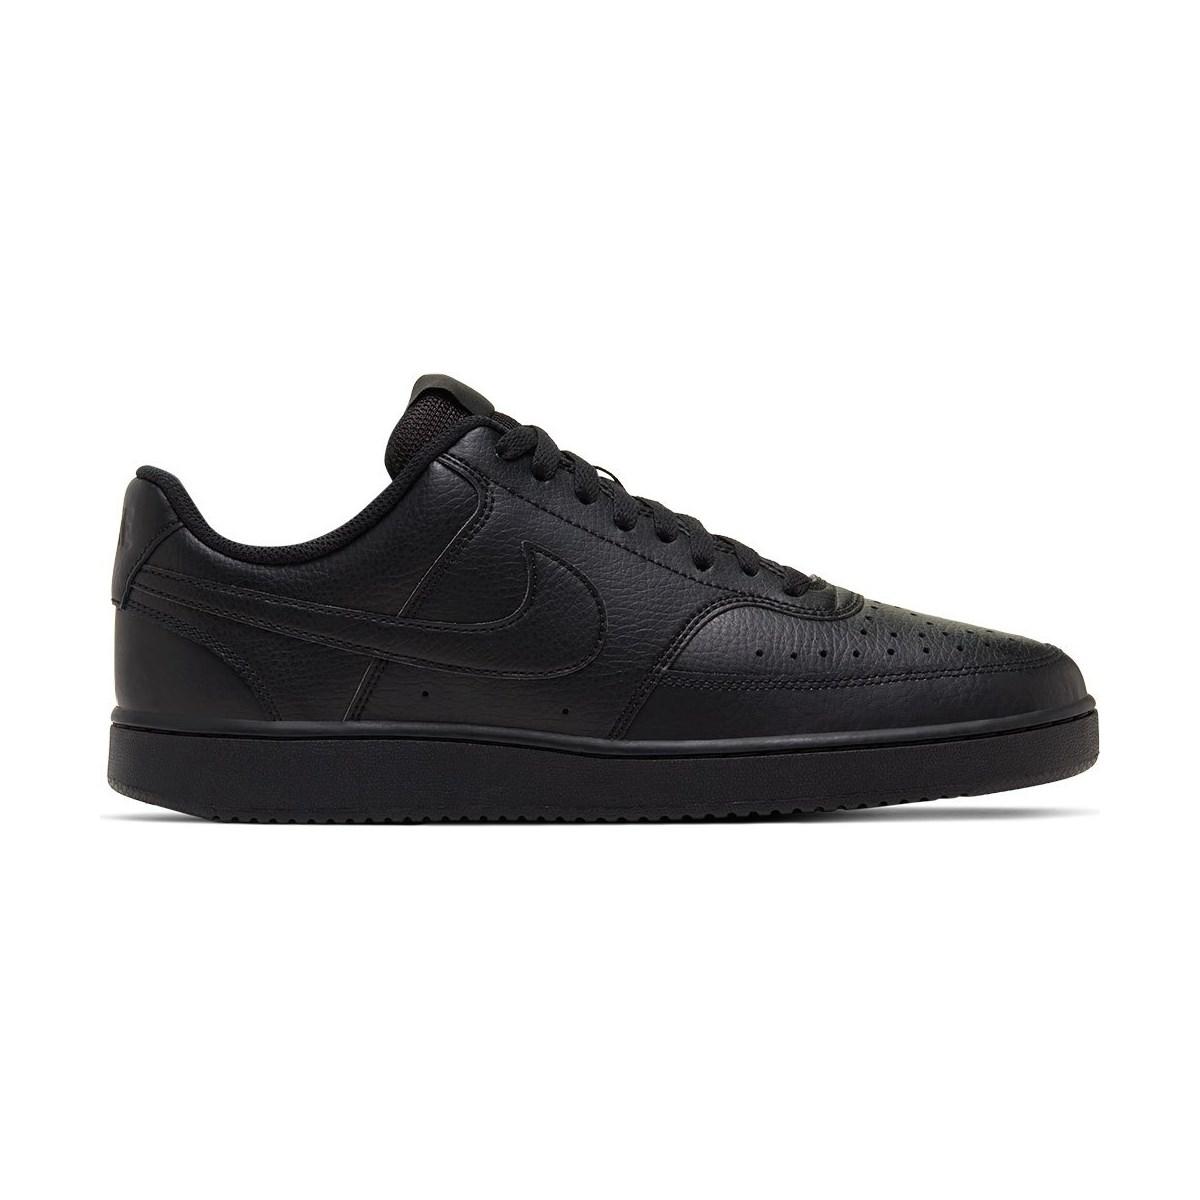 Court Vision Lo Erkek Siyah Sneaker